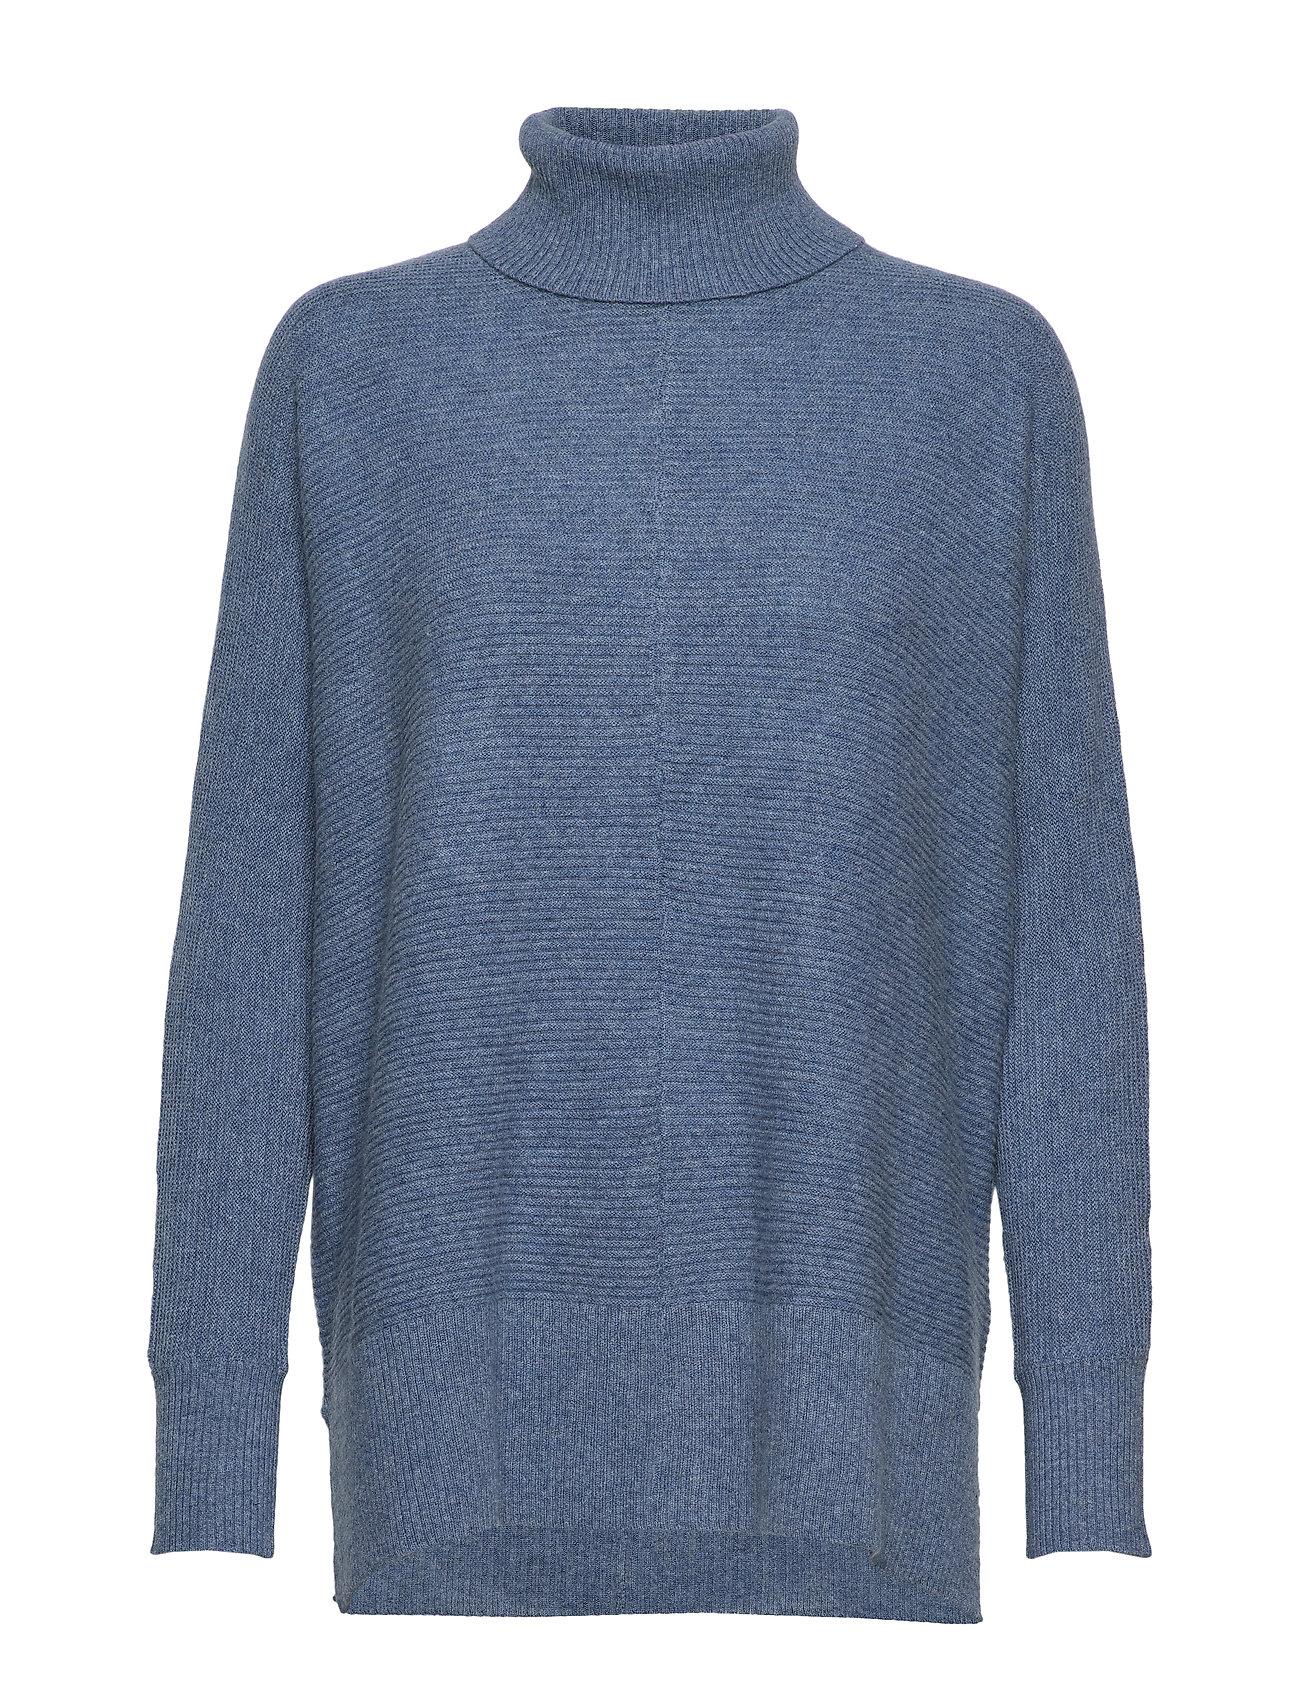 Davida Cashmere Rib Polo Loose Sweater - DUSTY BLUE